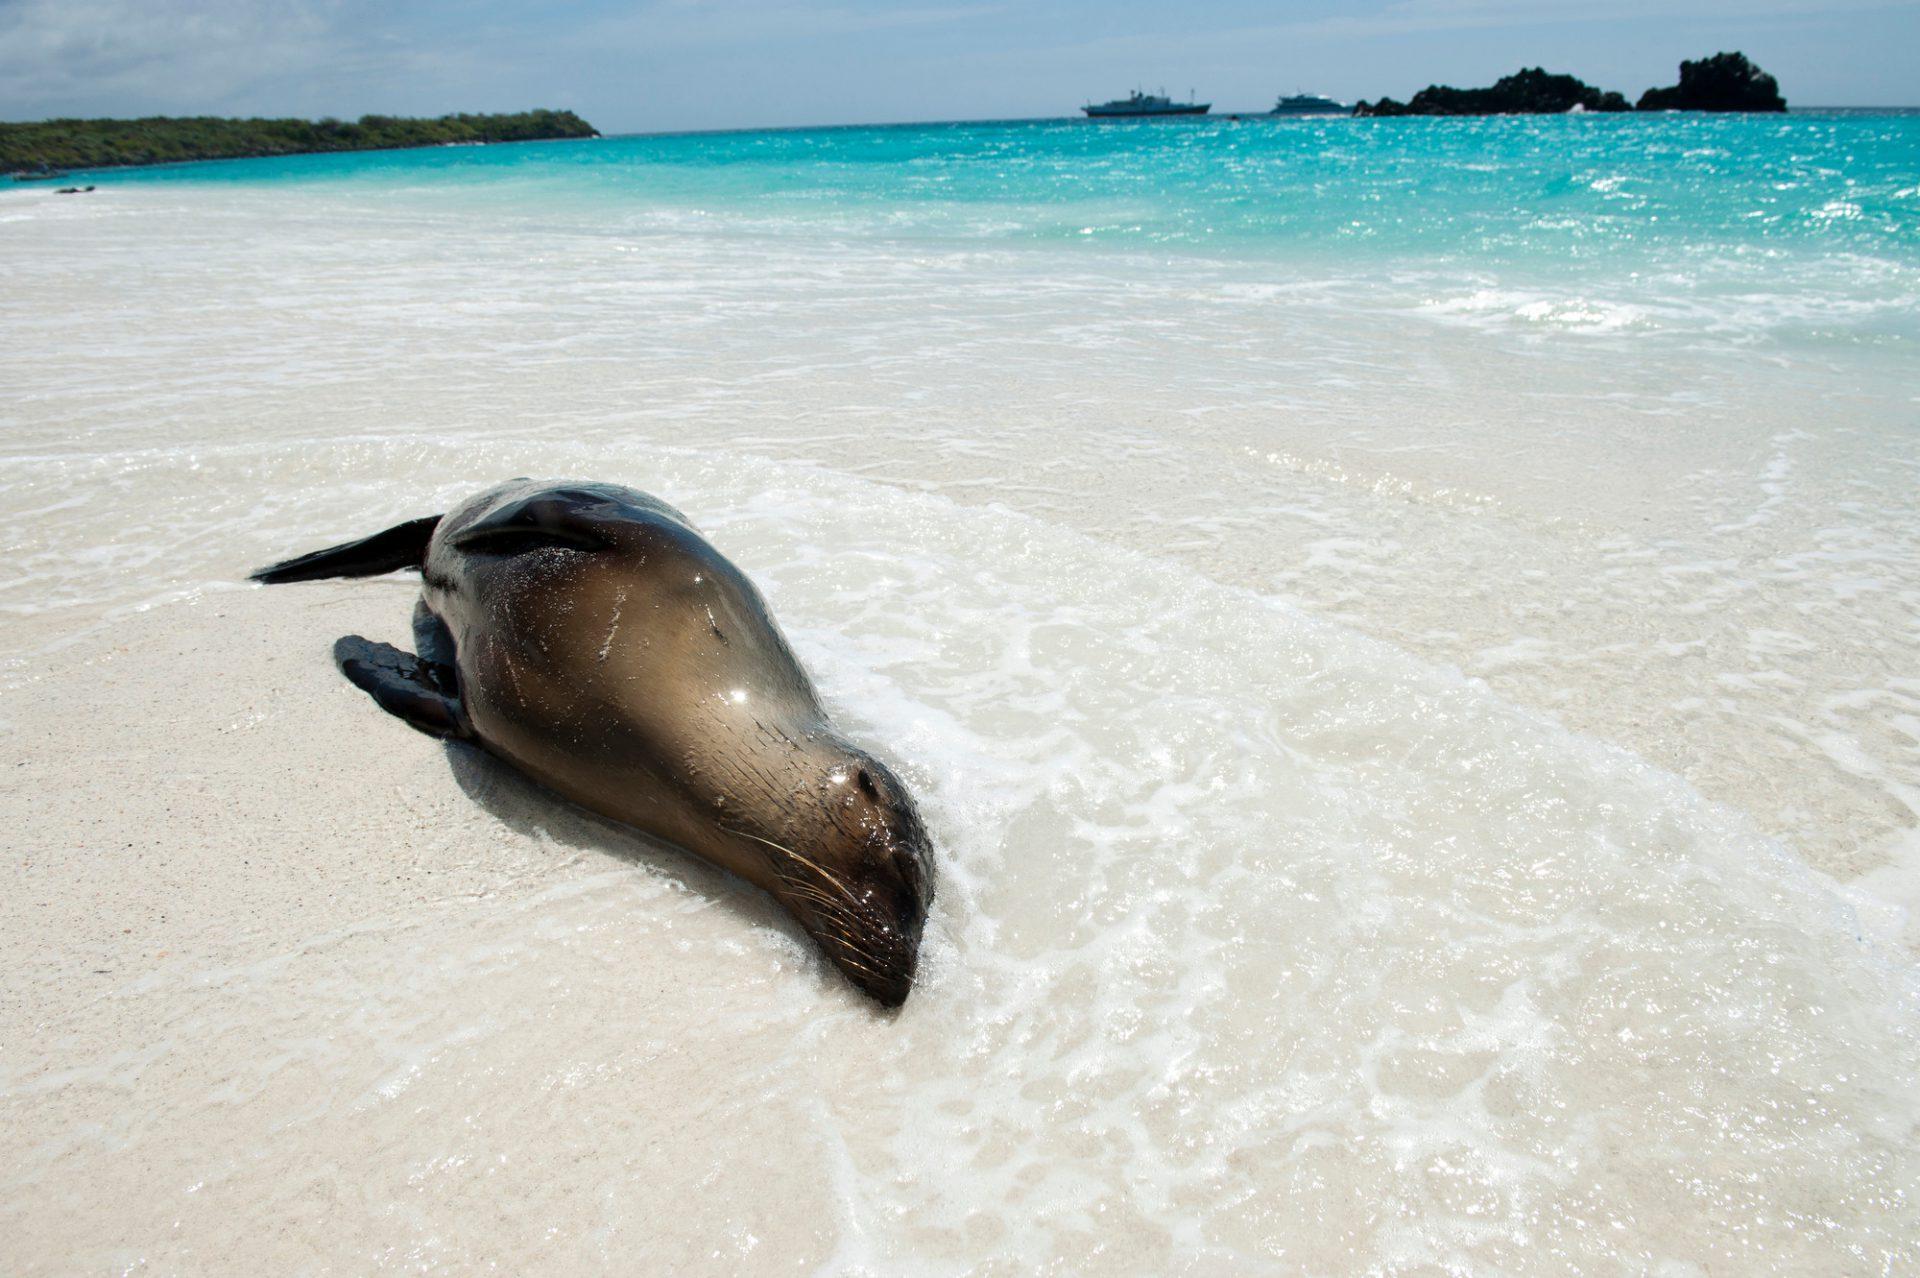 Photo: An endangered Galapagos sea lion, Zalophus wollebaeki, on the beach at Espanola Island in Galapagos National Park.